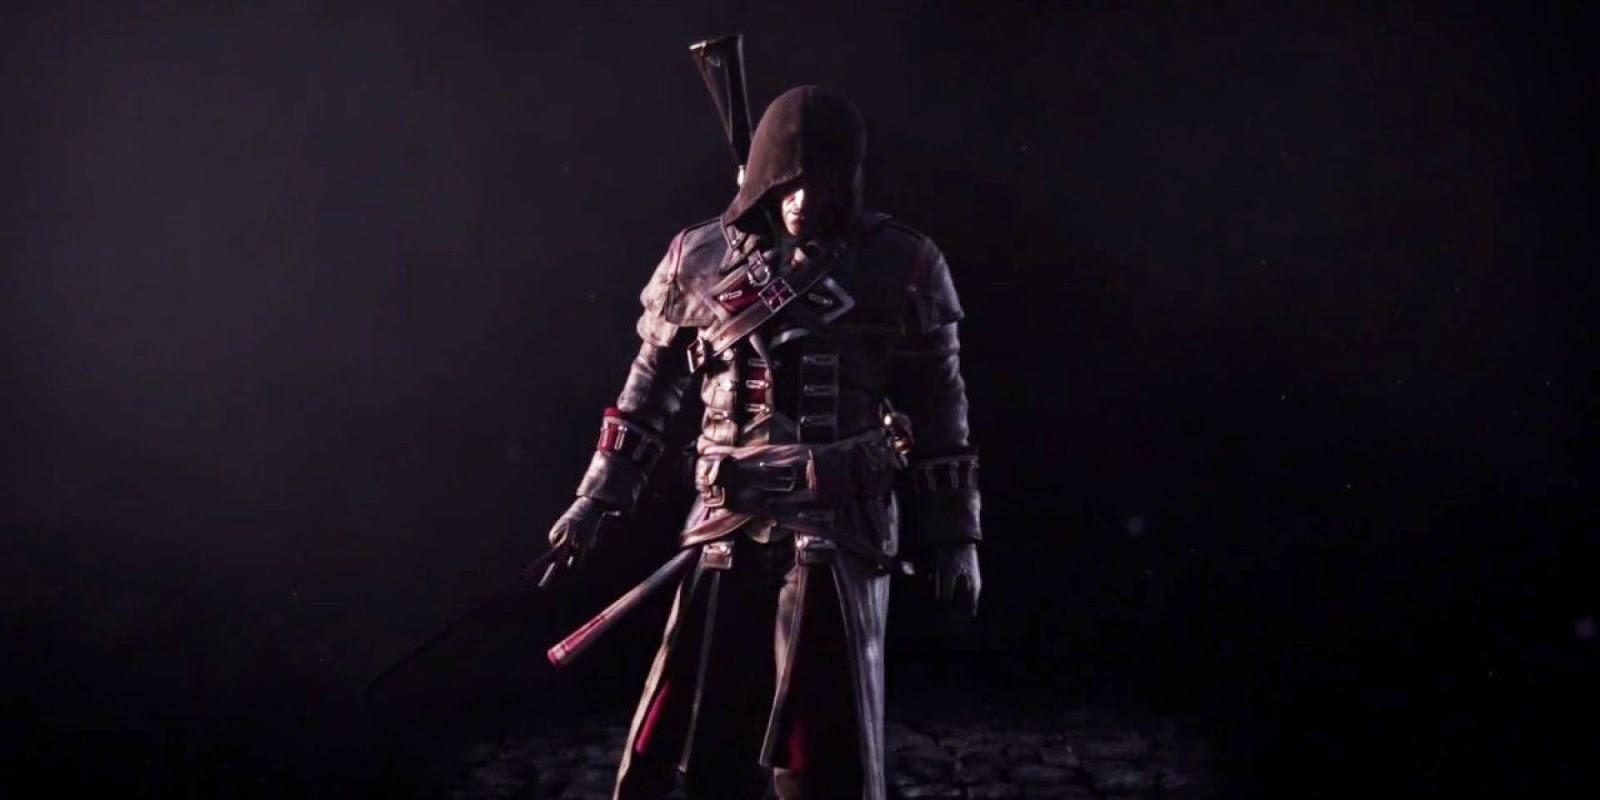 Assassin's Creed Rogue Wallpaper - WallpaperSafari